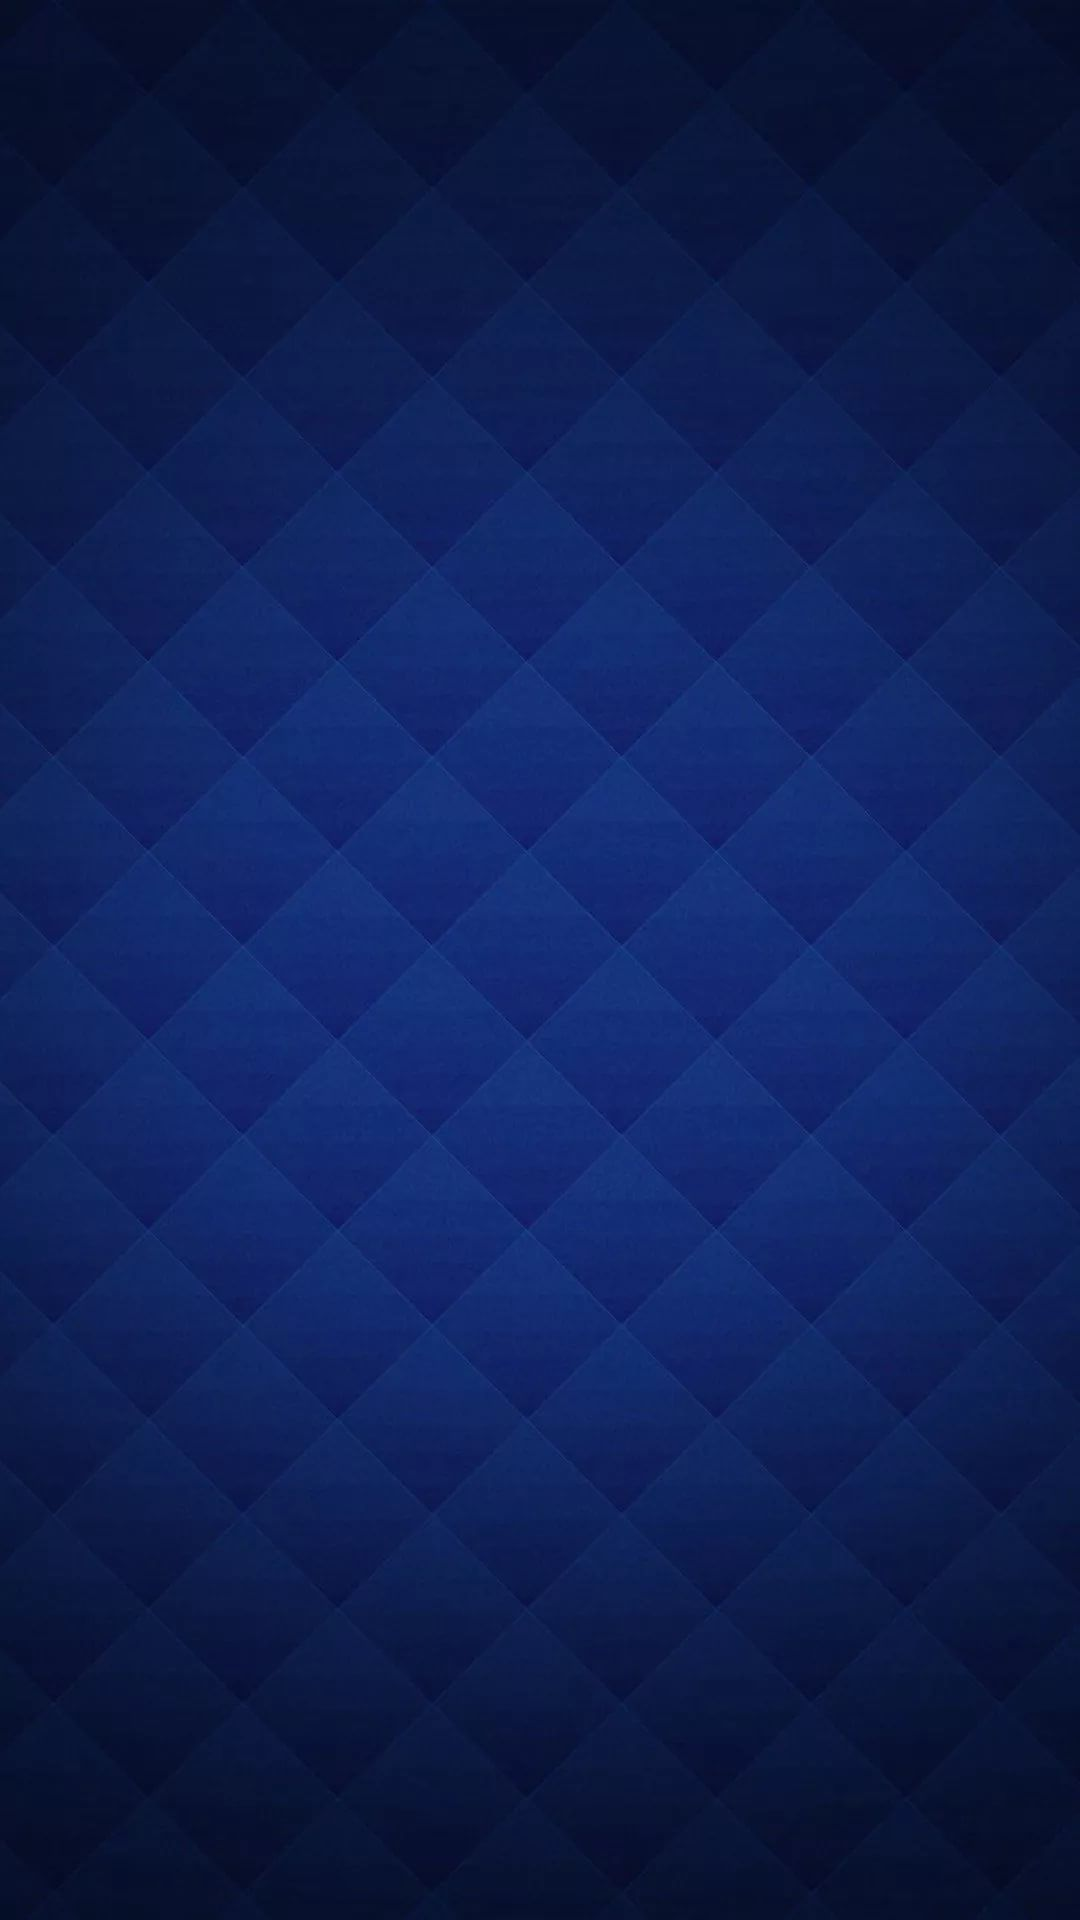 Dark Blue iPhone 7 wallpaper